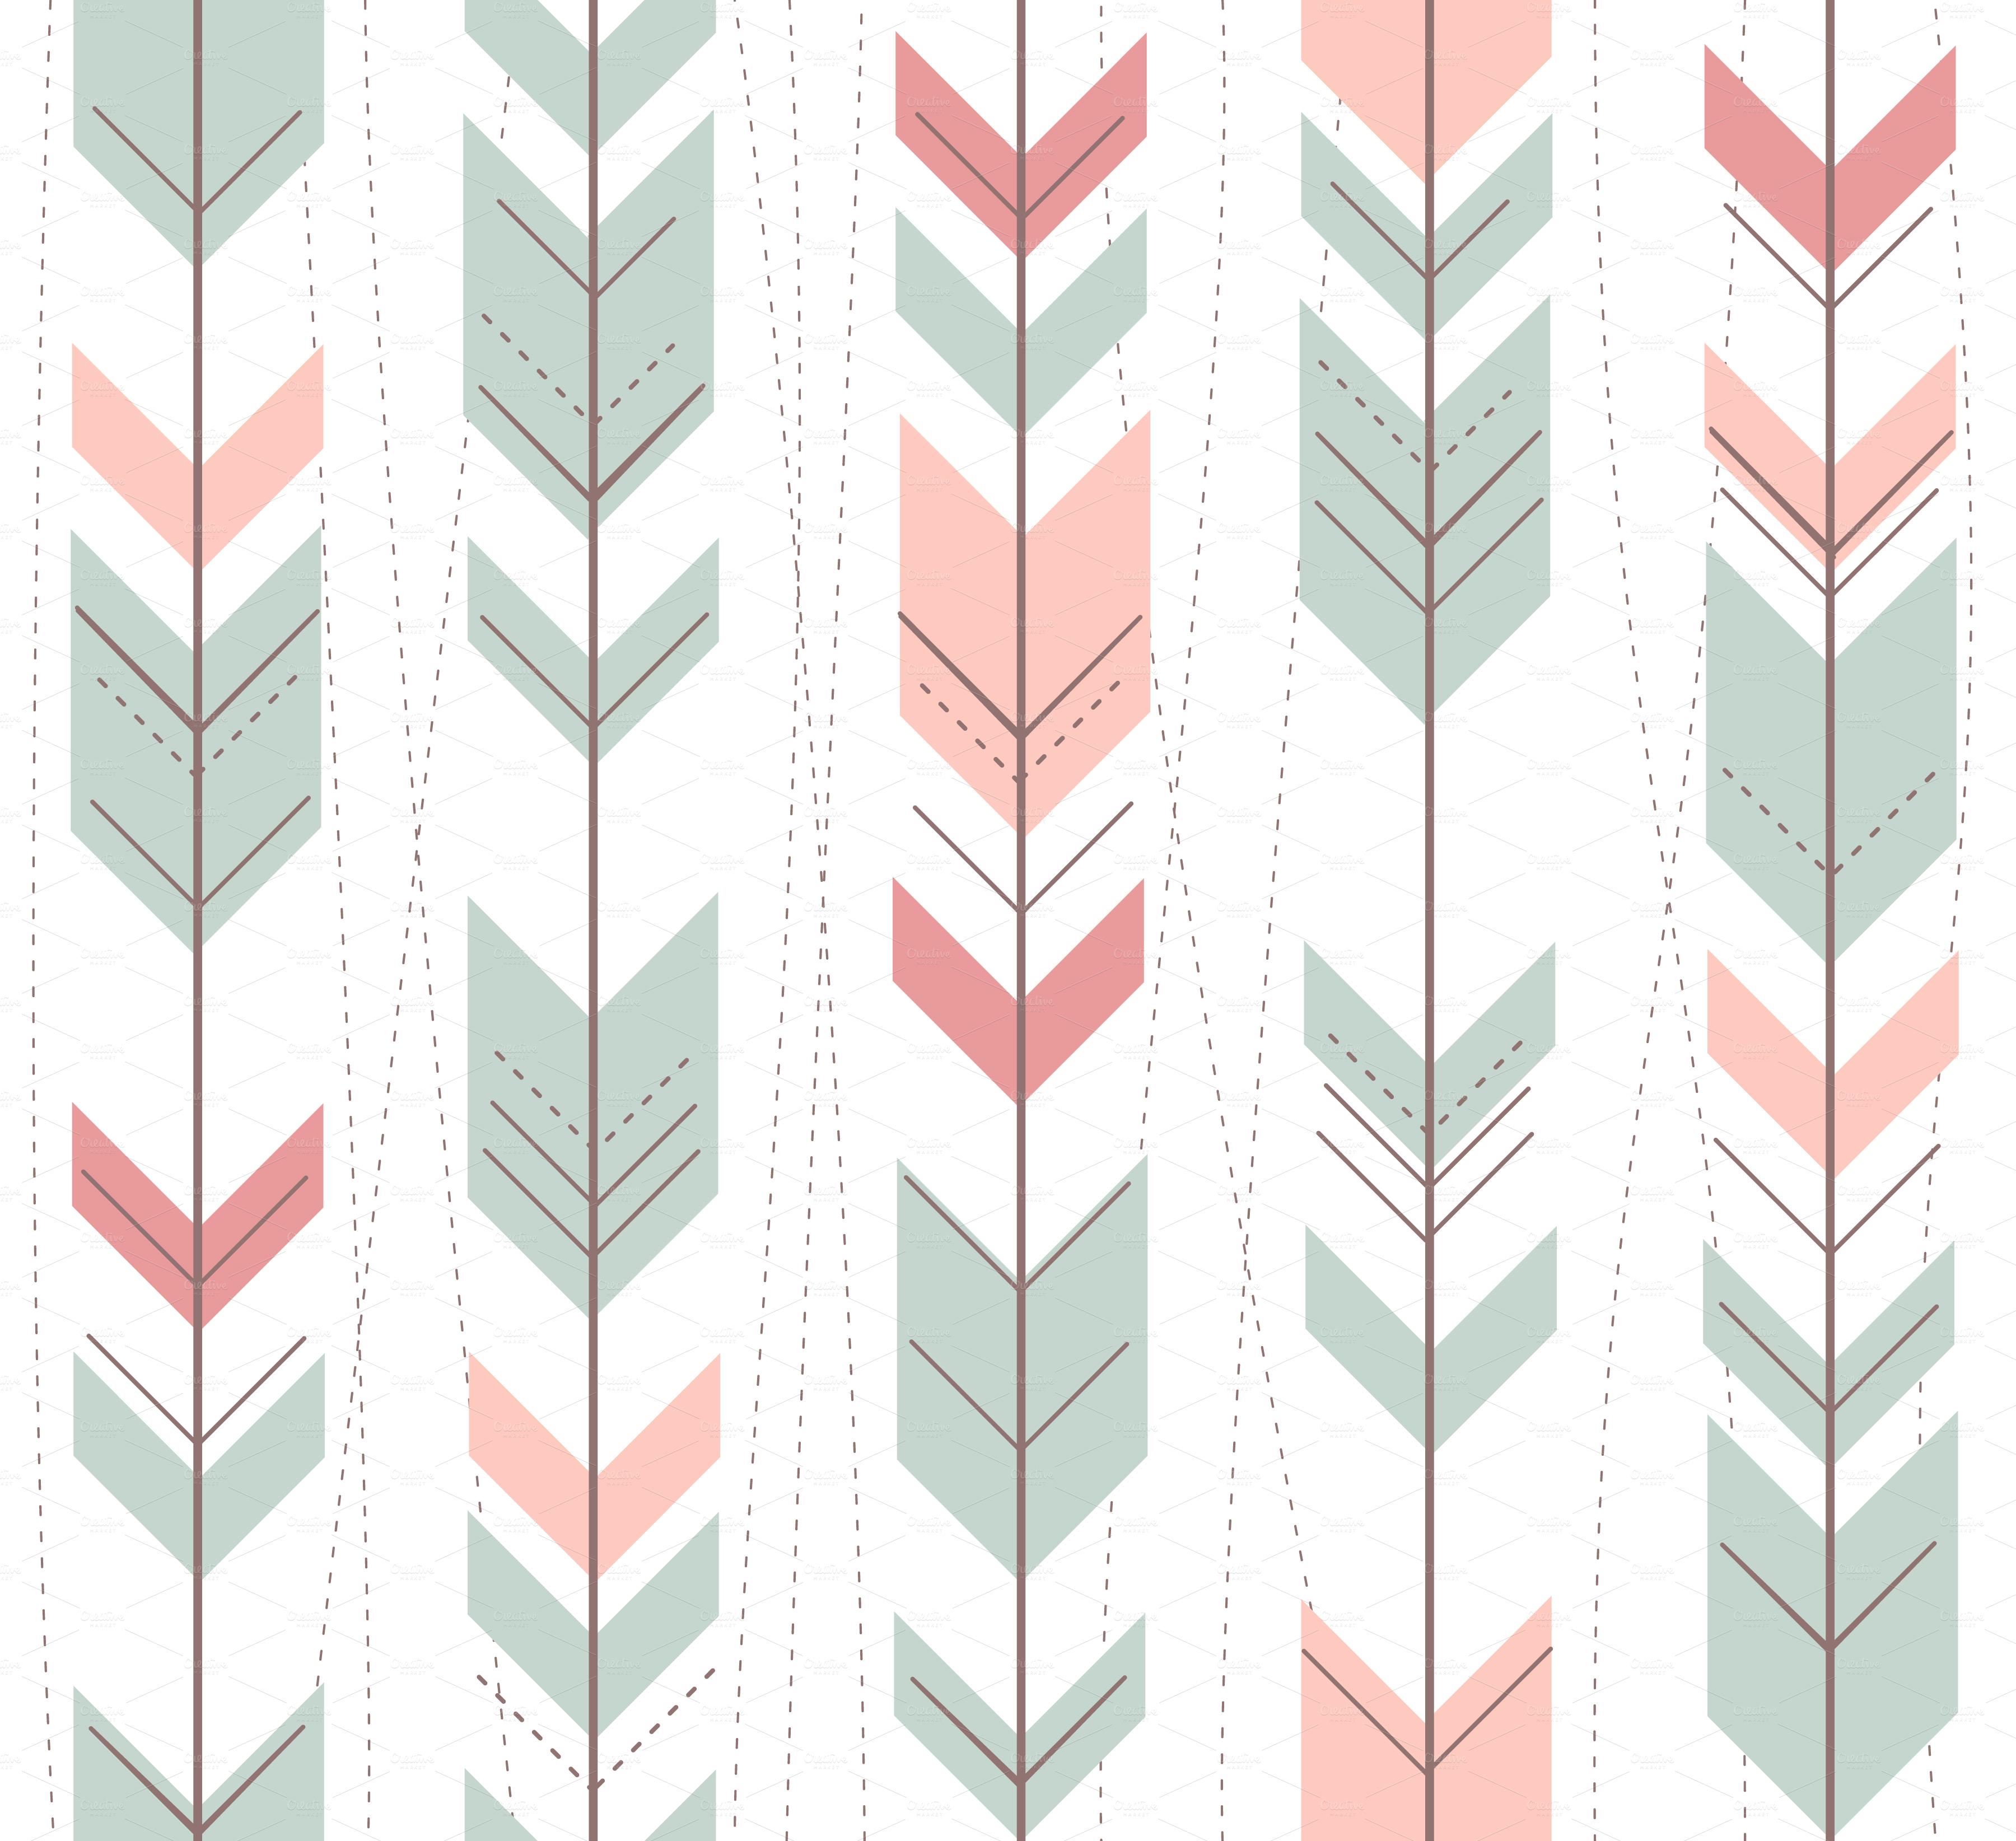 Tribal Arrow Wallpapers Top Free Tribal Arrow Backgrounds